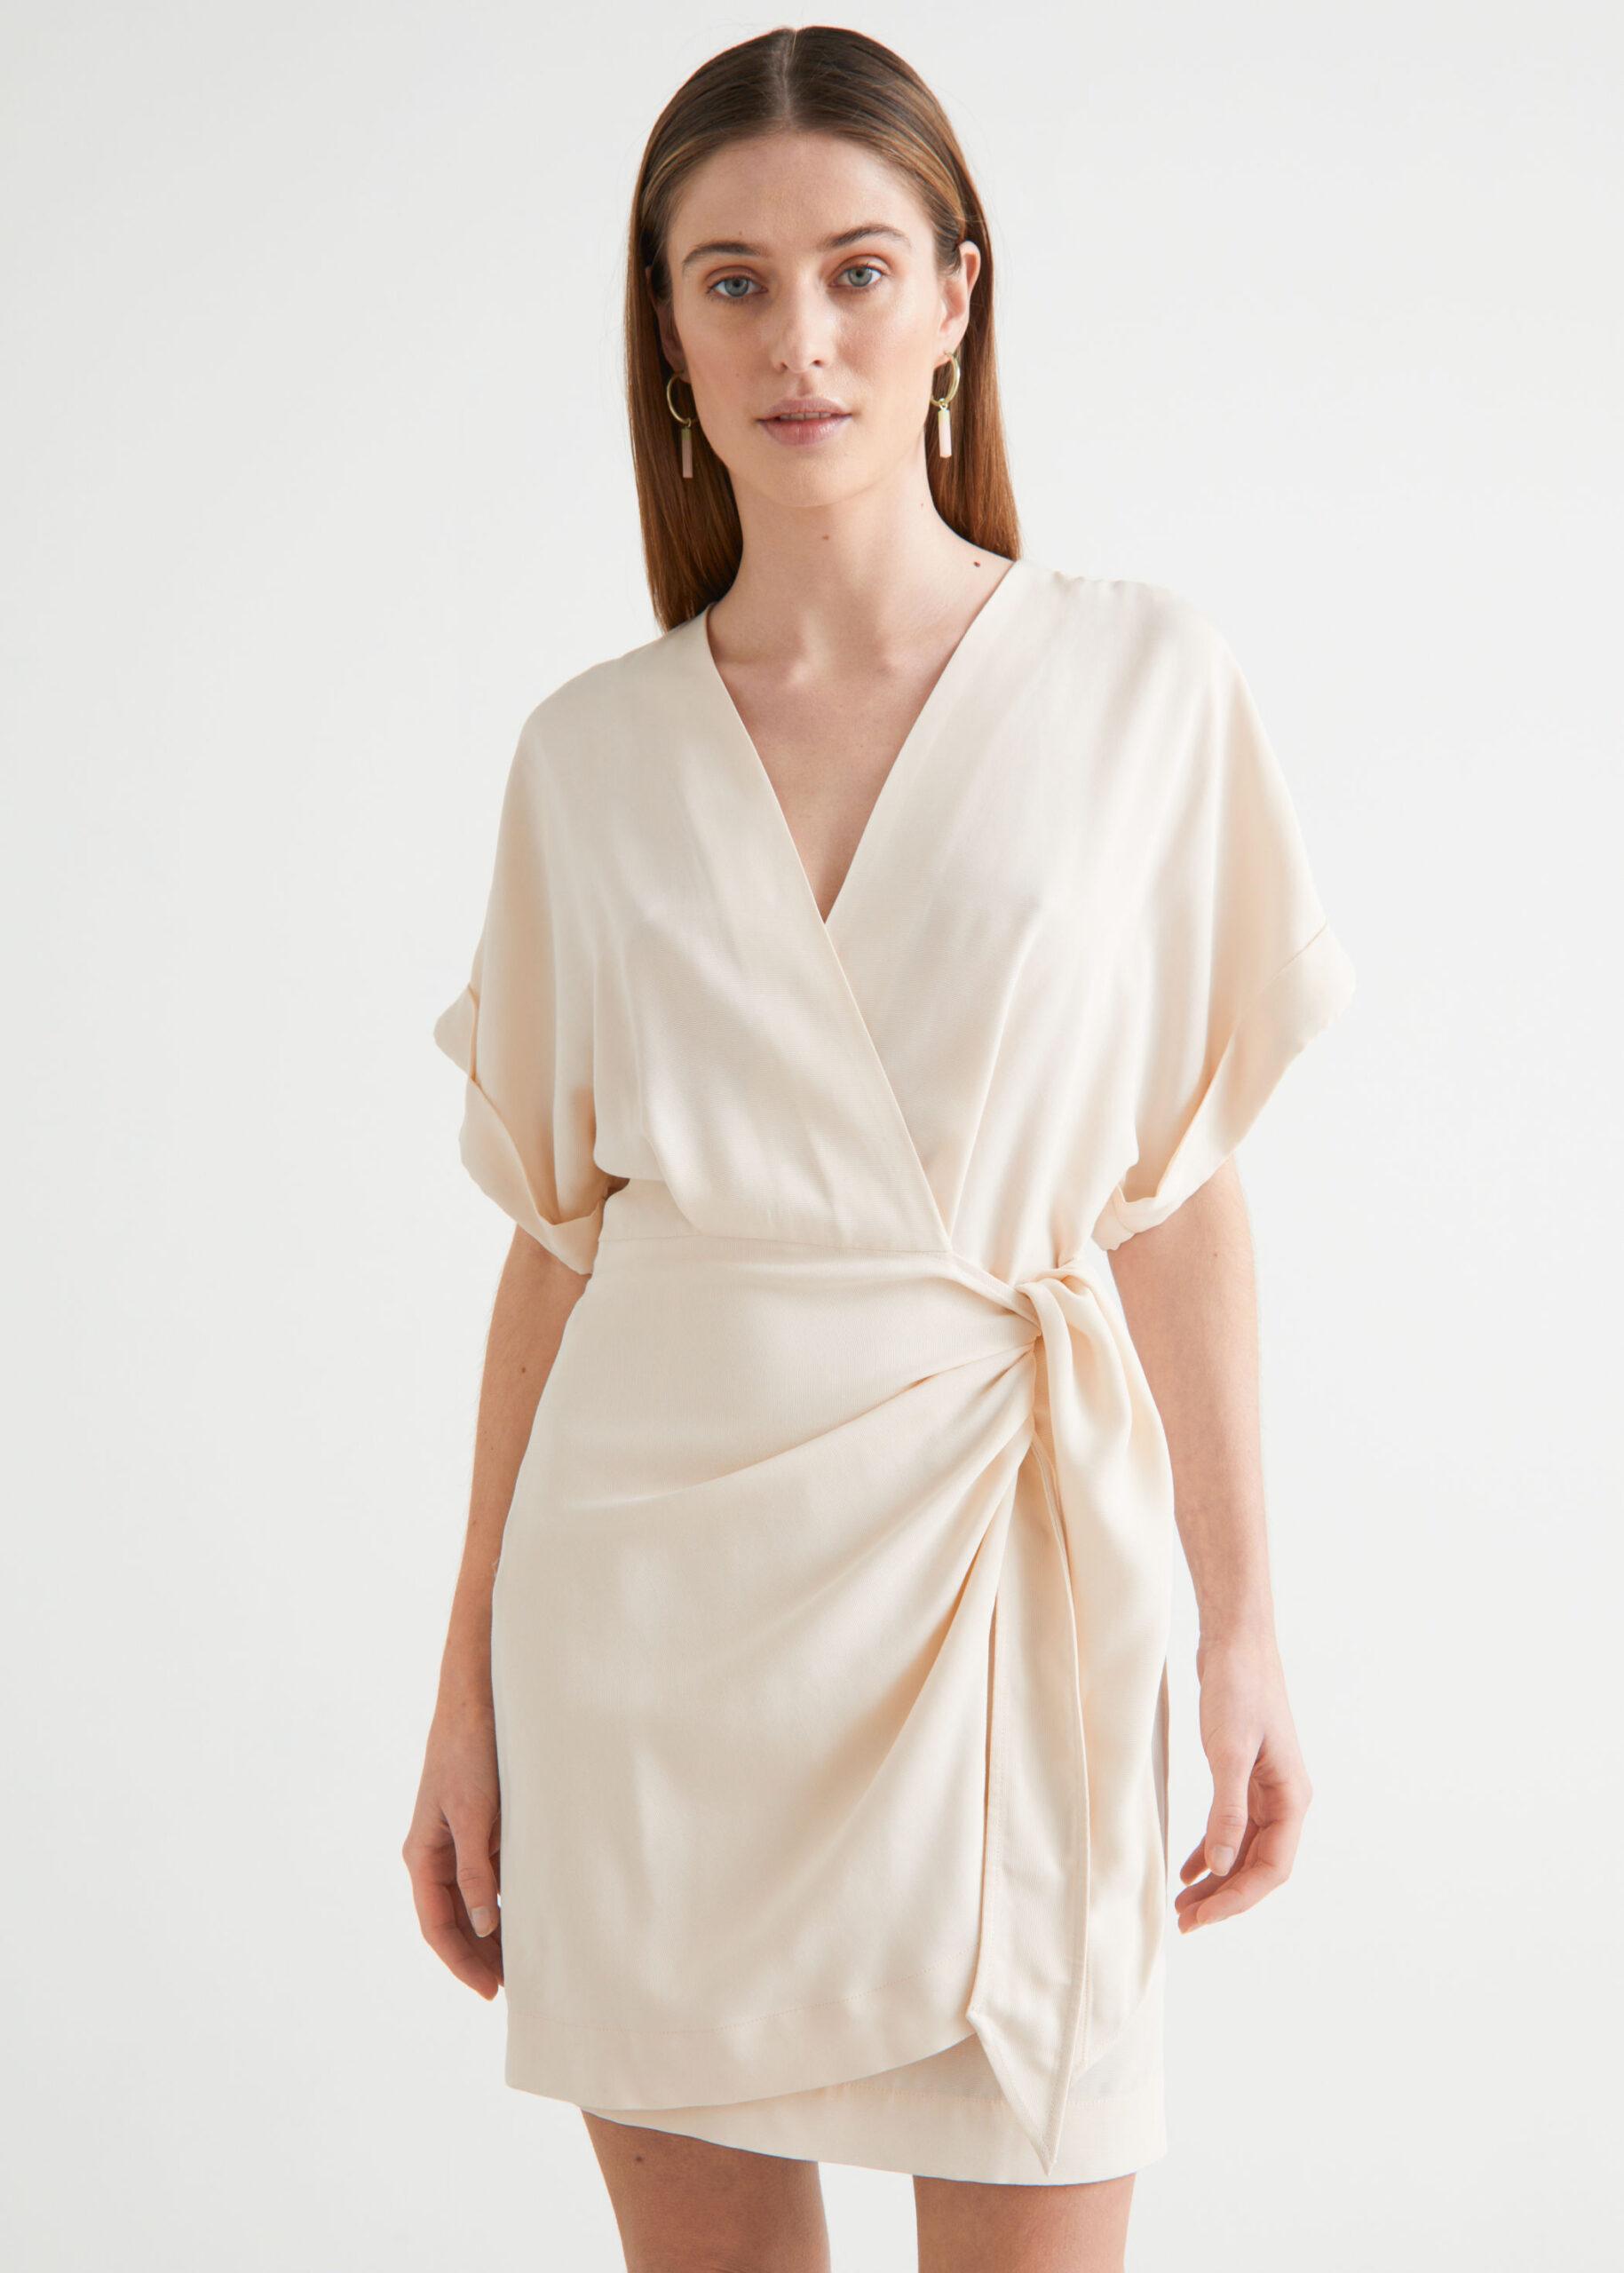 Relaxed Wrap Mini Dress $99